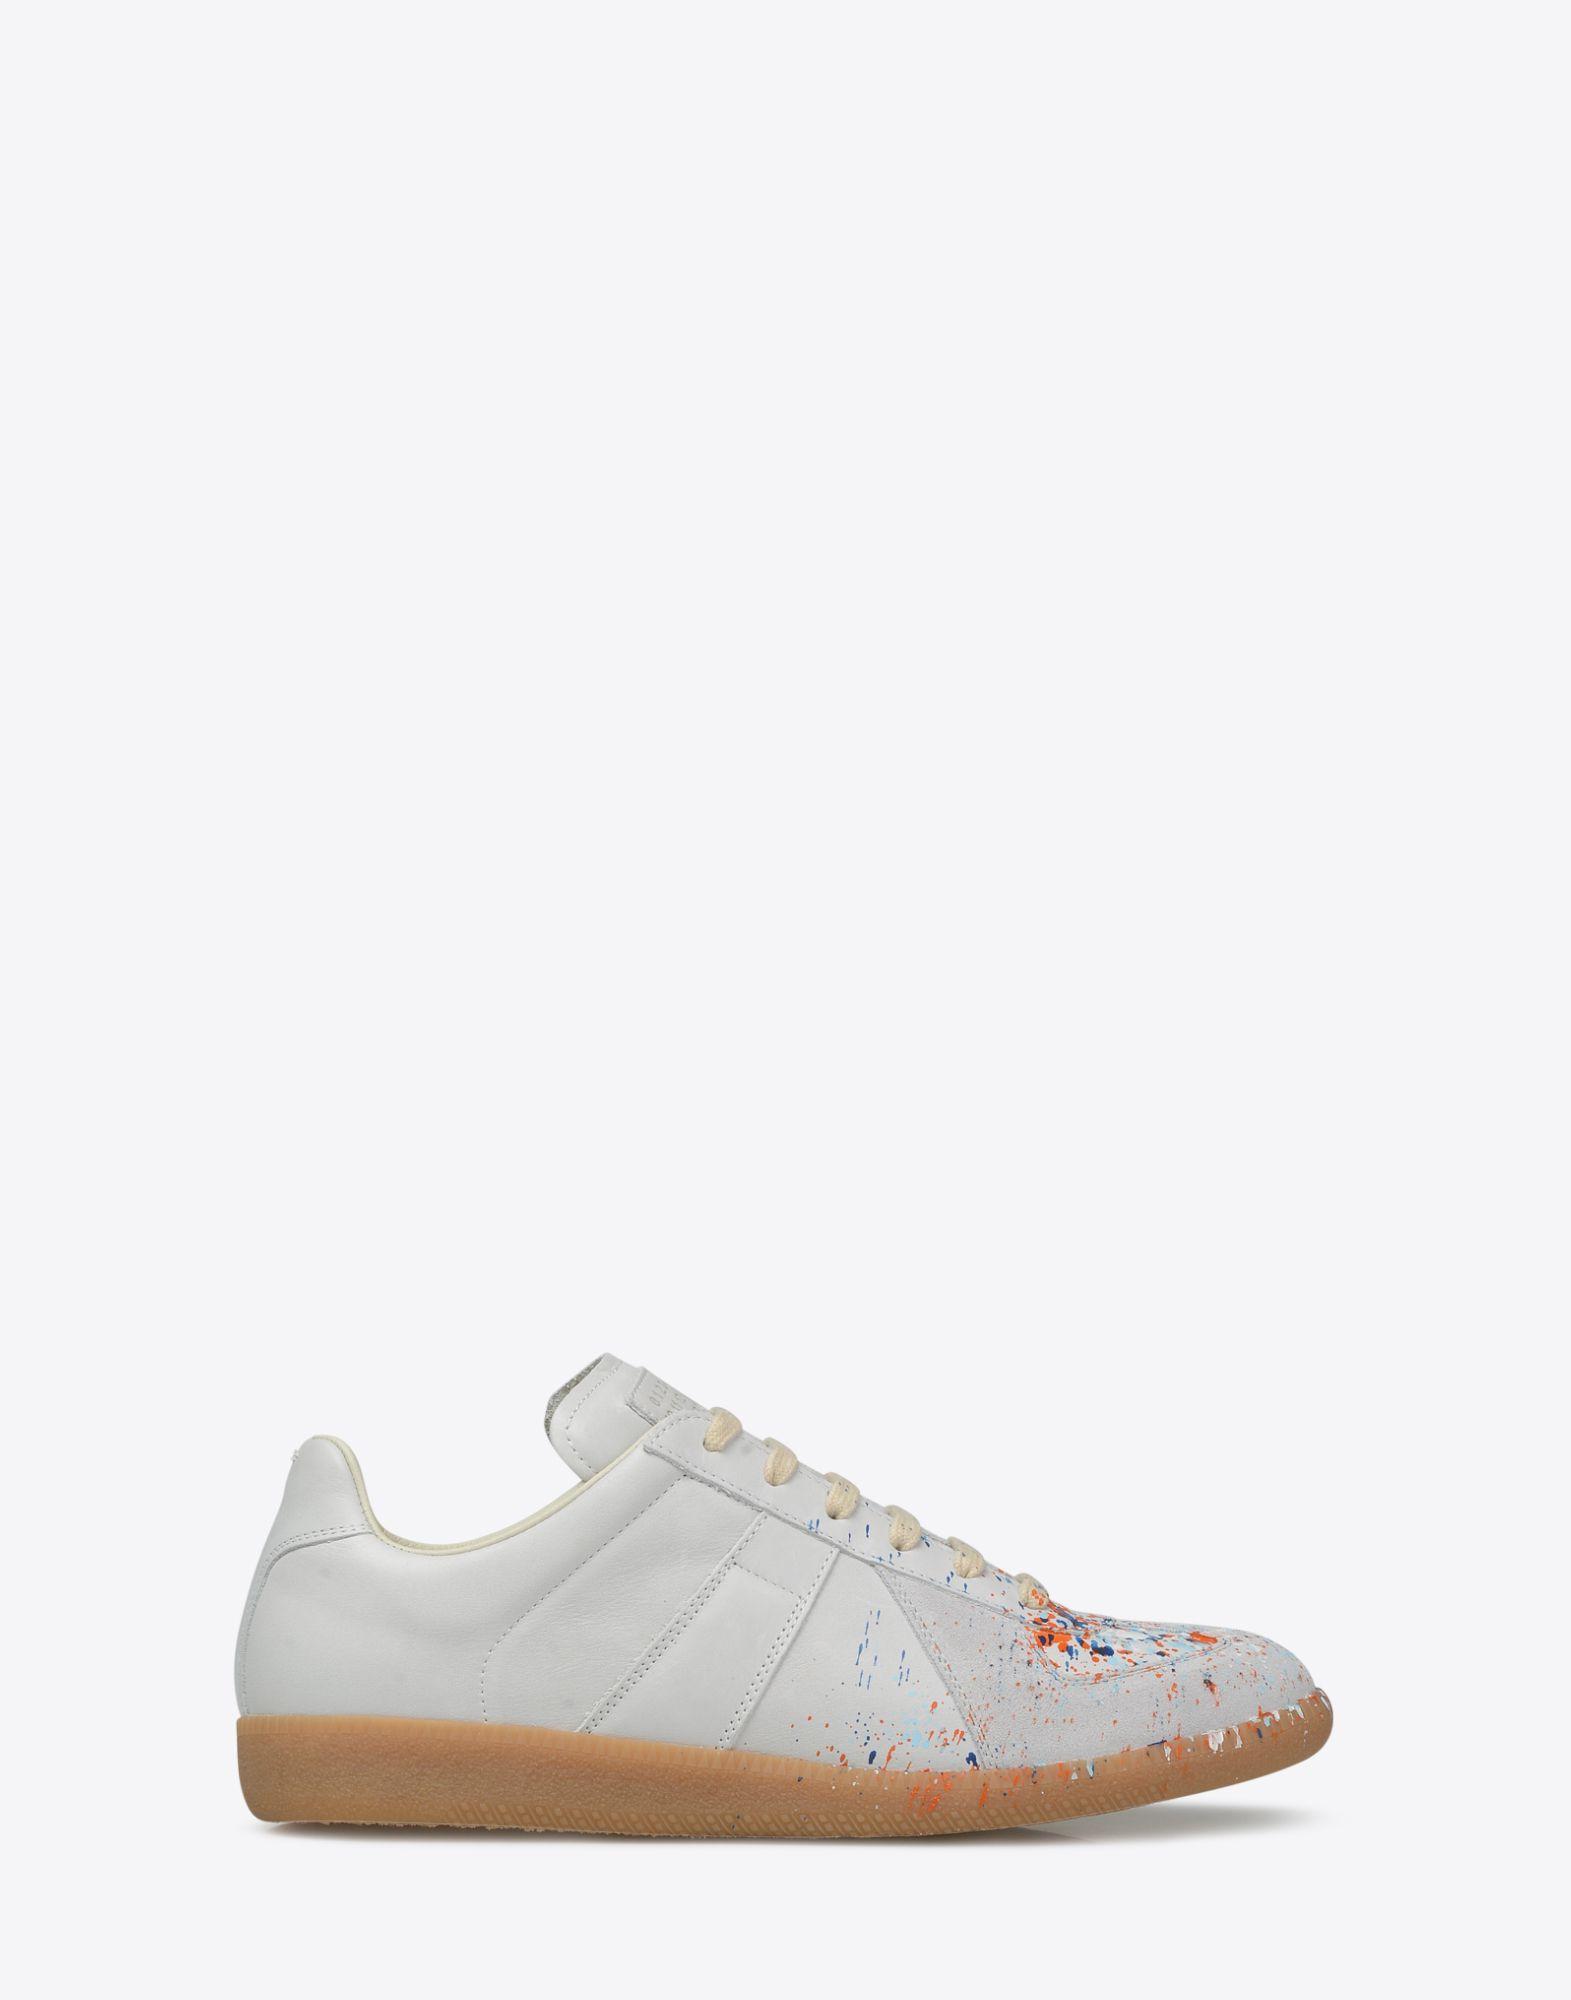 MAISON MARGIELA 'Replica' paint drop sneakers Sneakers Man f